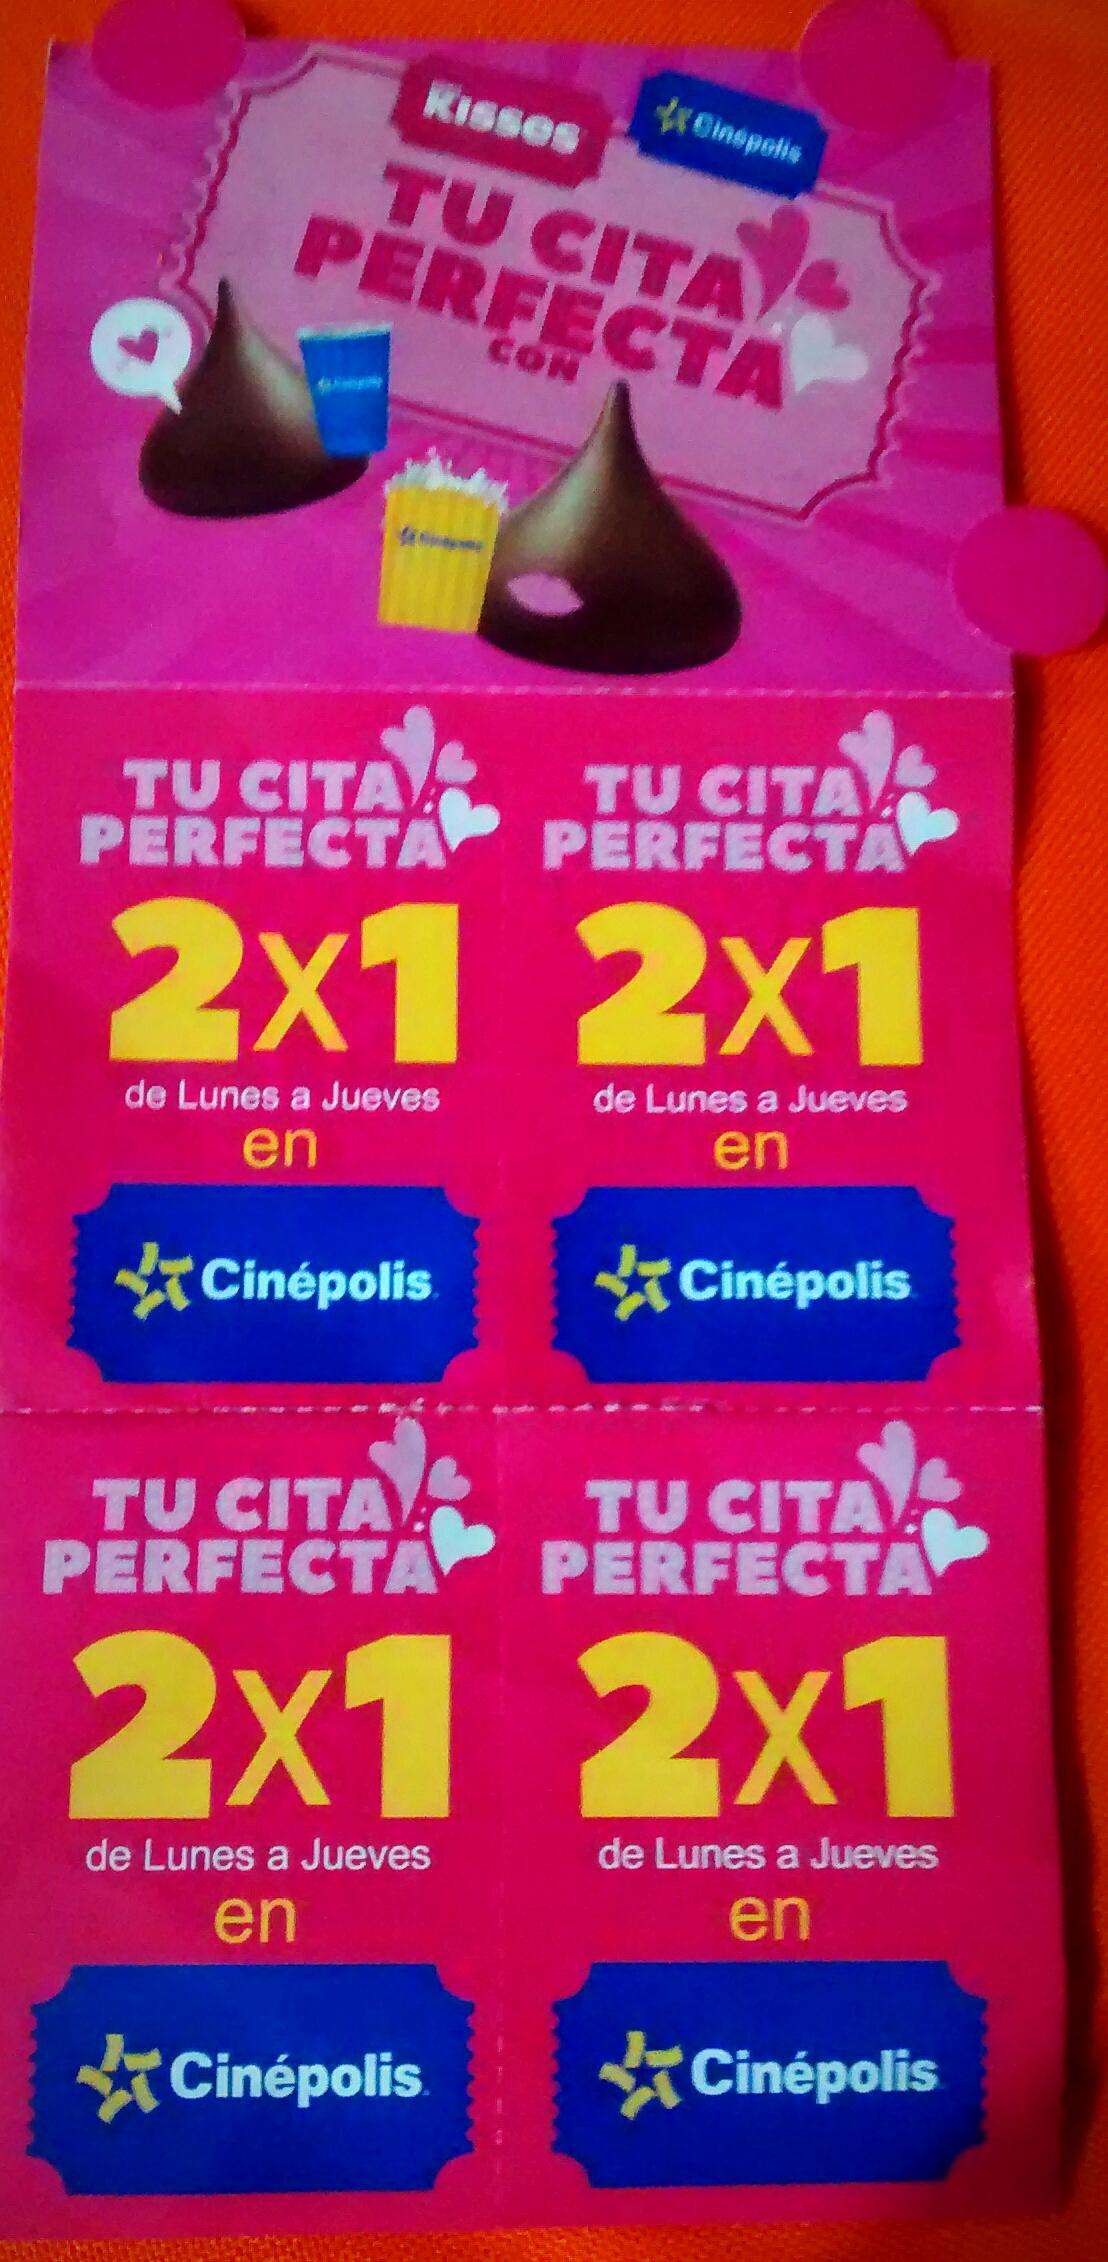 Cinépolis: 2x1 en boletos comprando Kisses